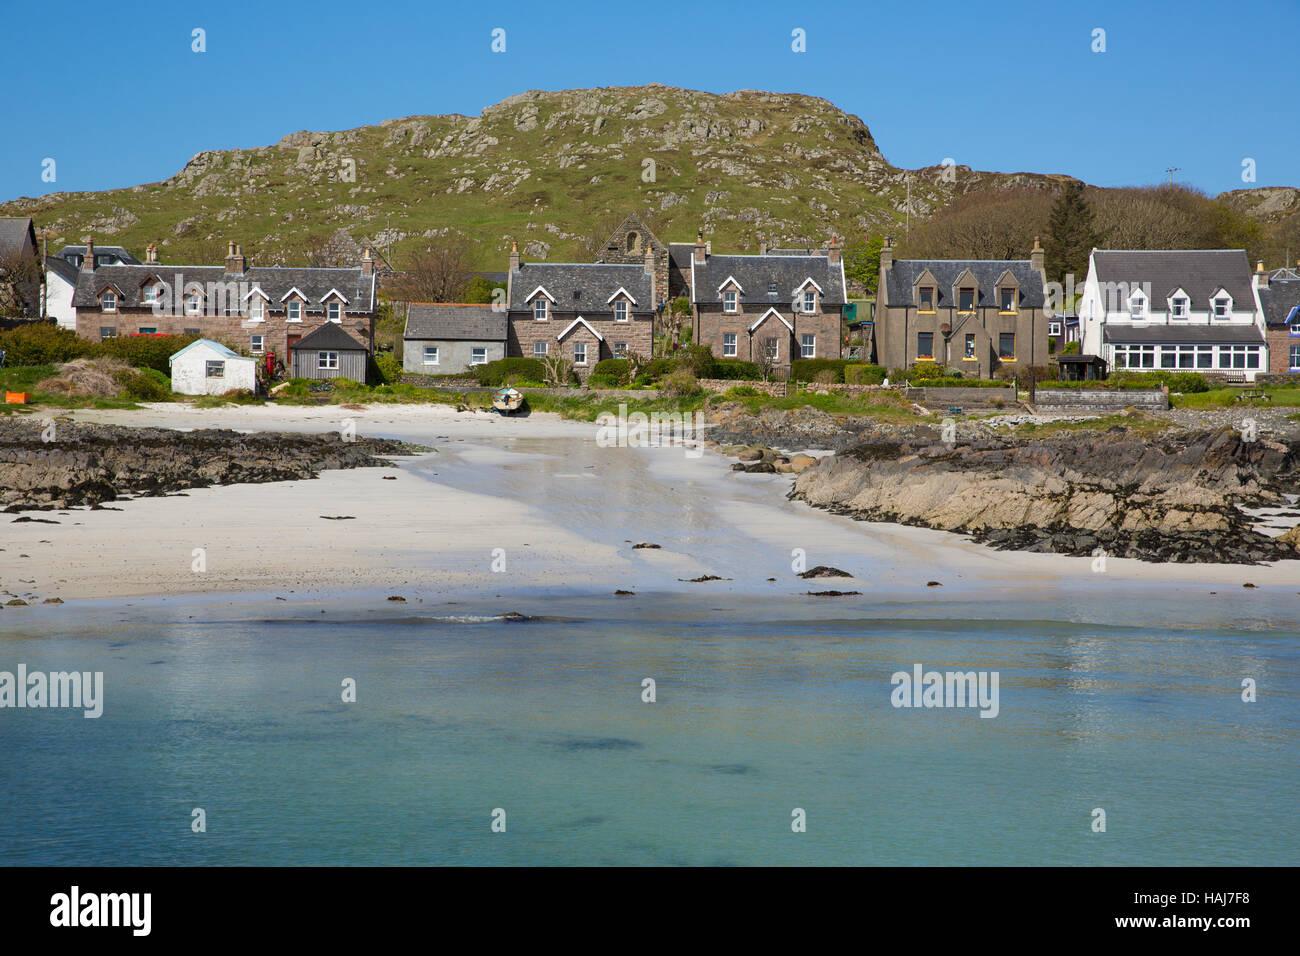 Inseldorf auf Iona Schottland uk Inneren Hebriden vor der Isle of ...